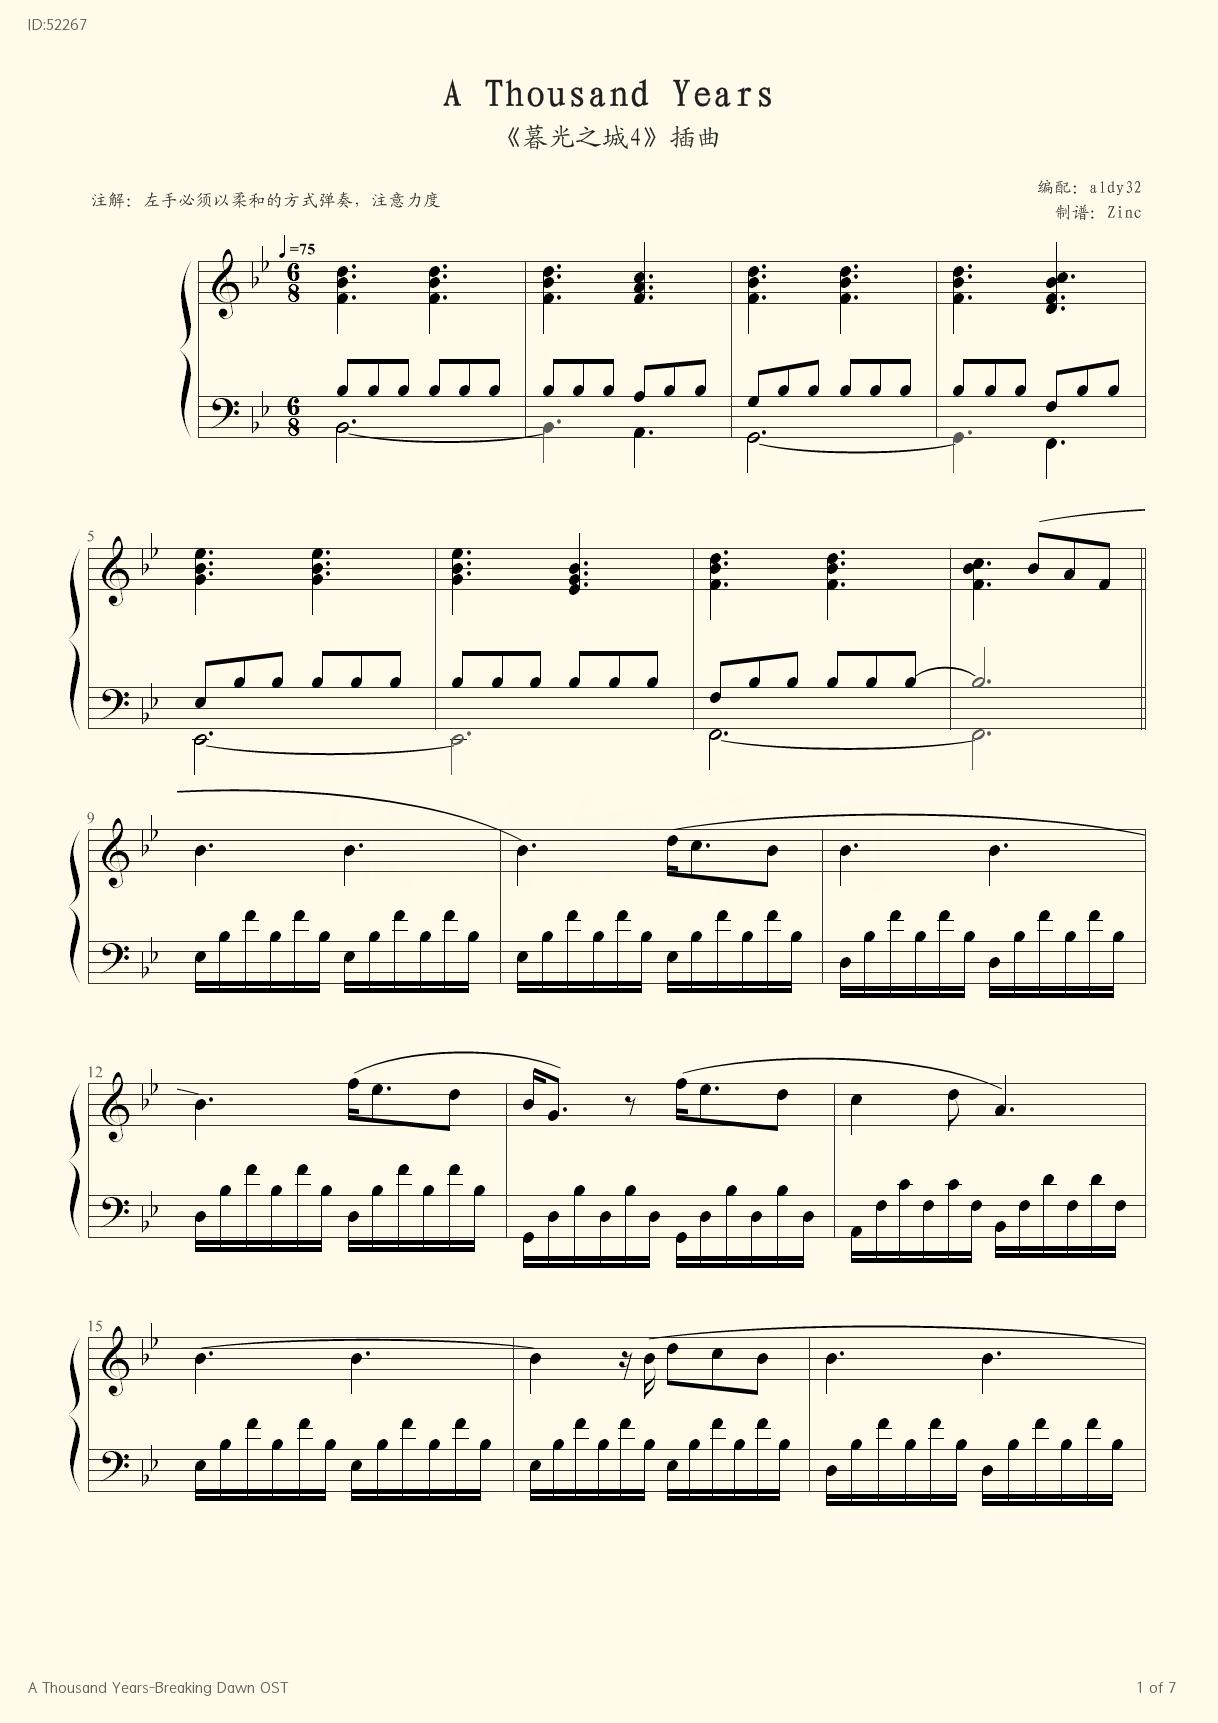 how to play christina perri a thousand years on piano